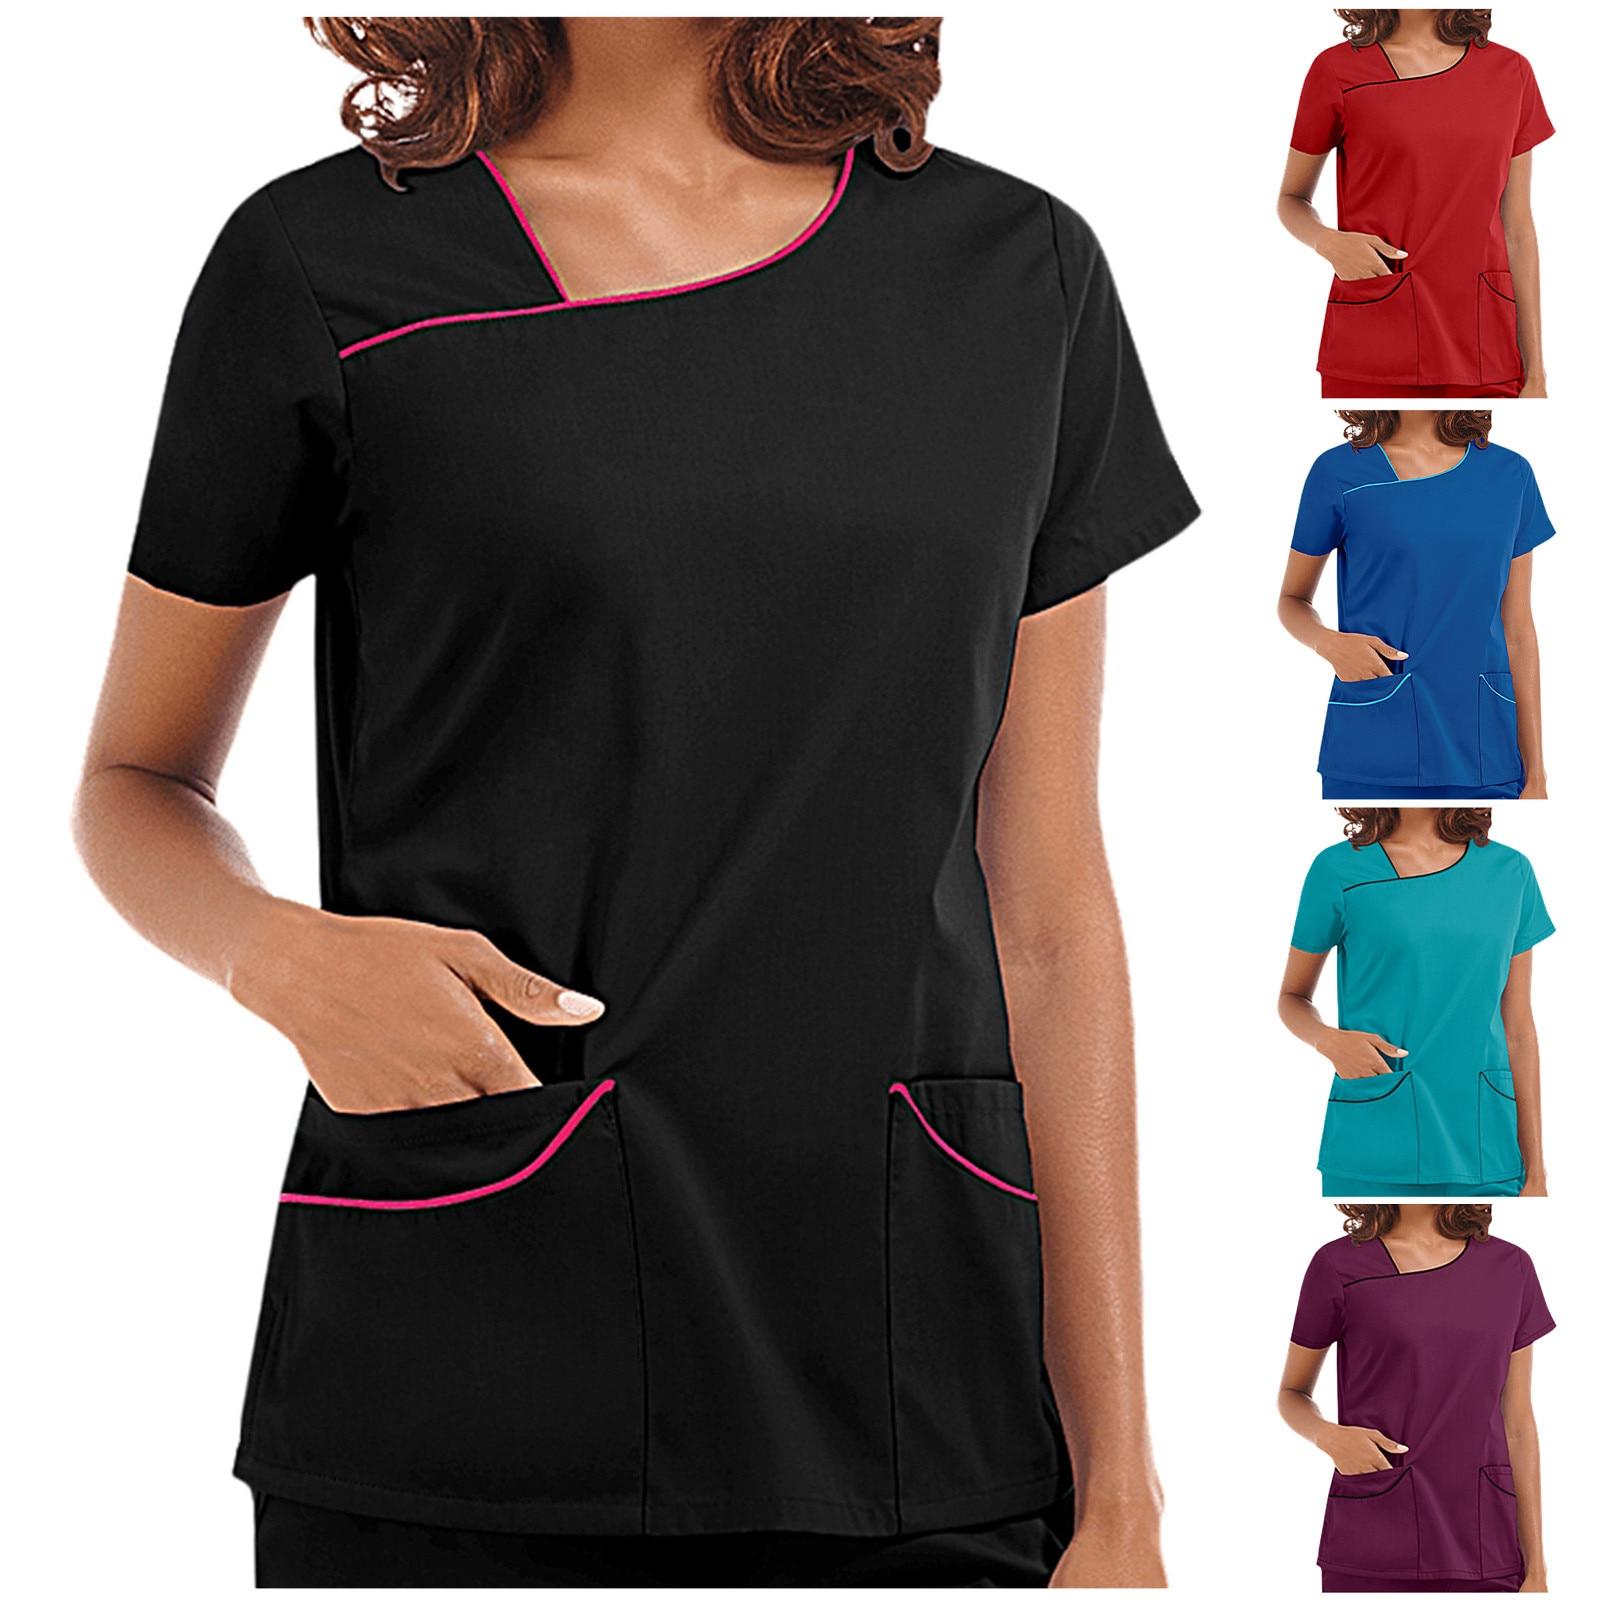 Working Nurse Uniform Solid Color short Sleeve V-neck Pocket Blouse Tops Scrubs Women Breathable Pharmacy Nursing Uniform pharmacy